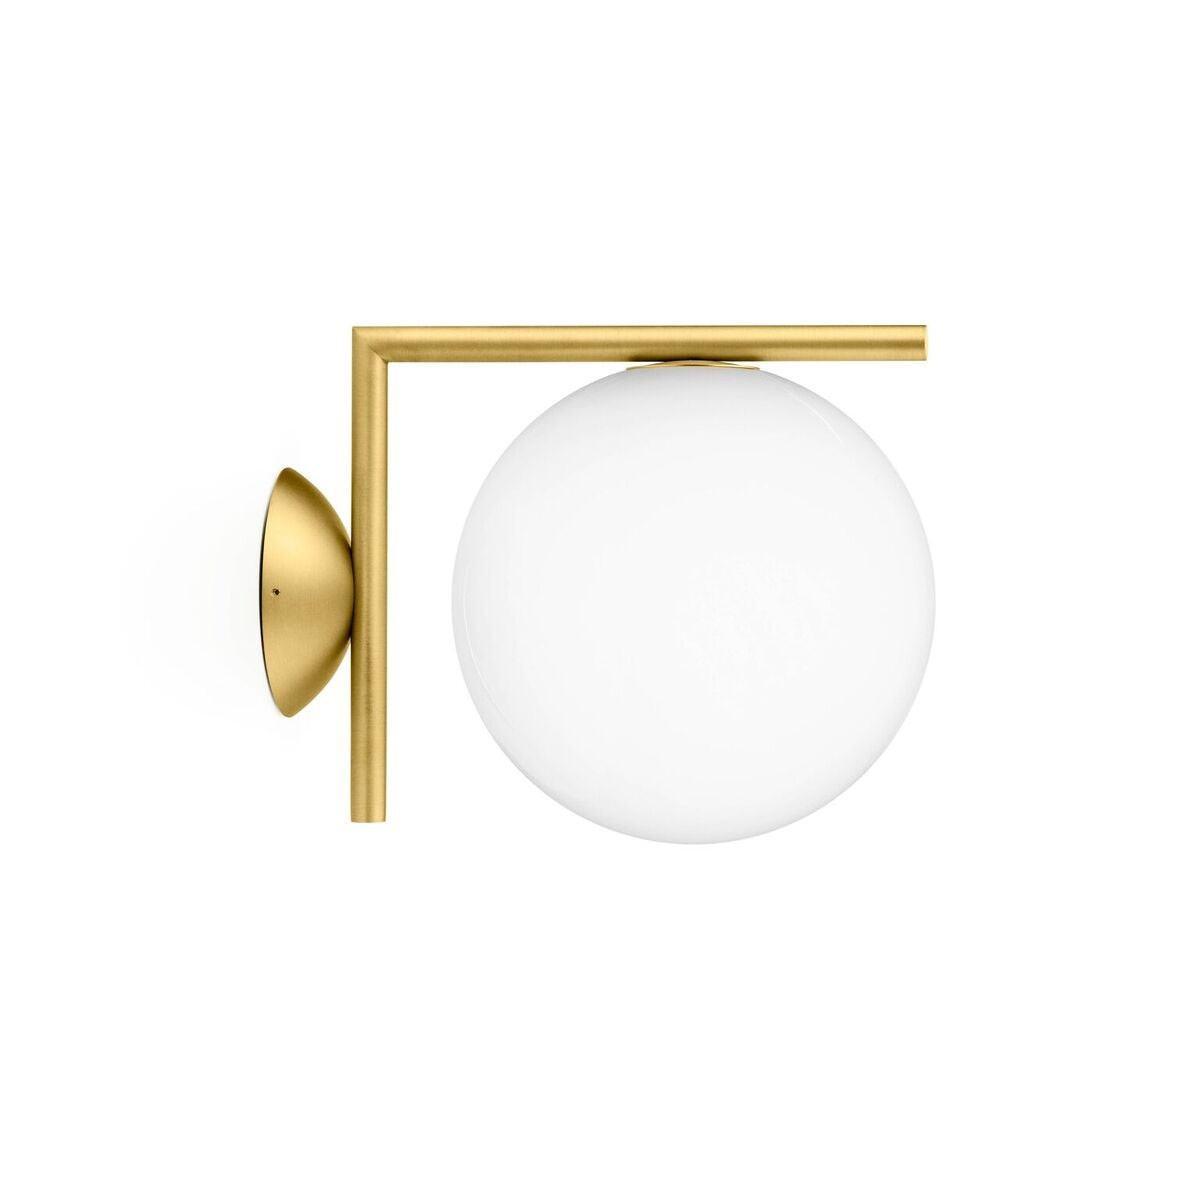 Flos IC C/W1 Ceiling/Wall Light -Brass